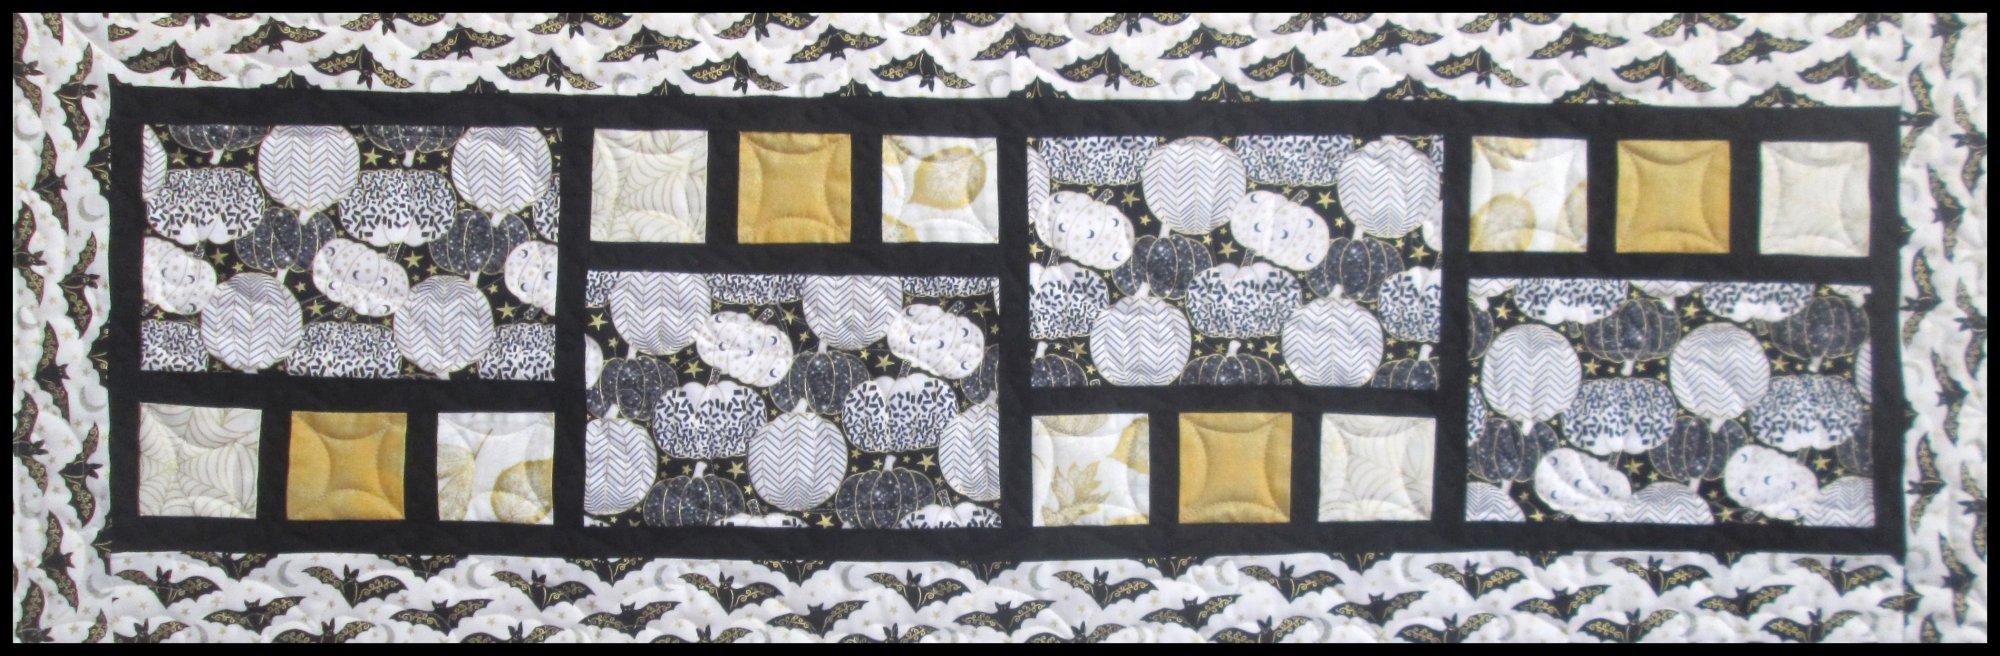 Midnight Spell All Squared Up Table Runner Kit